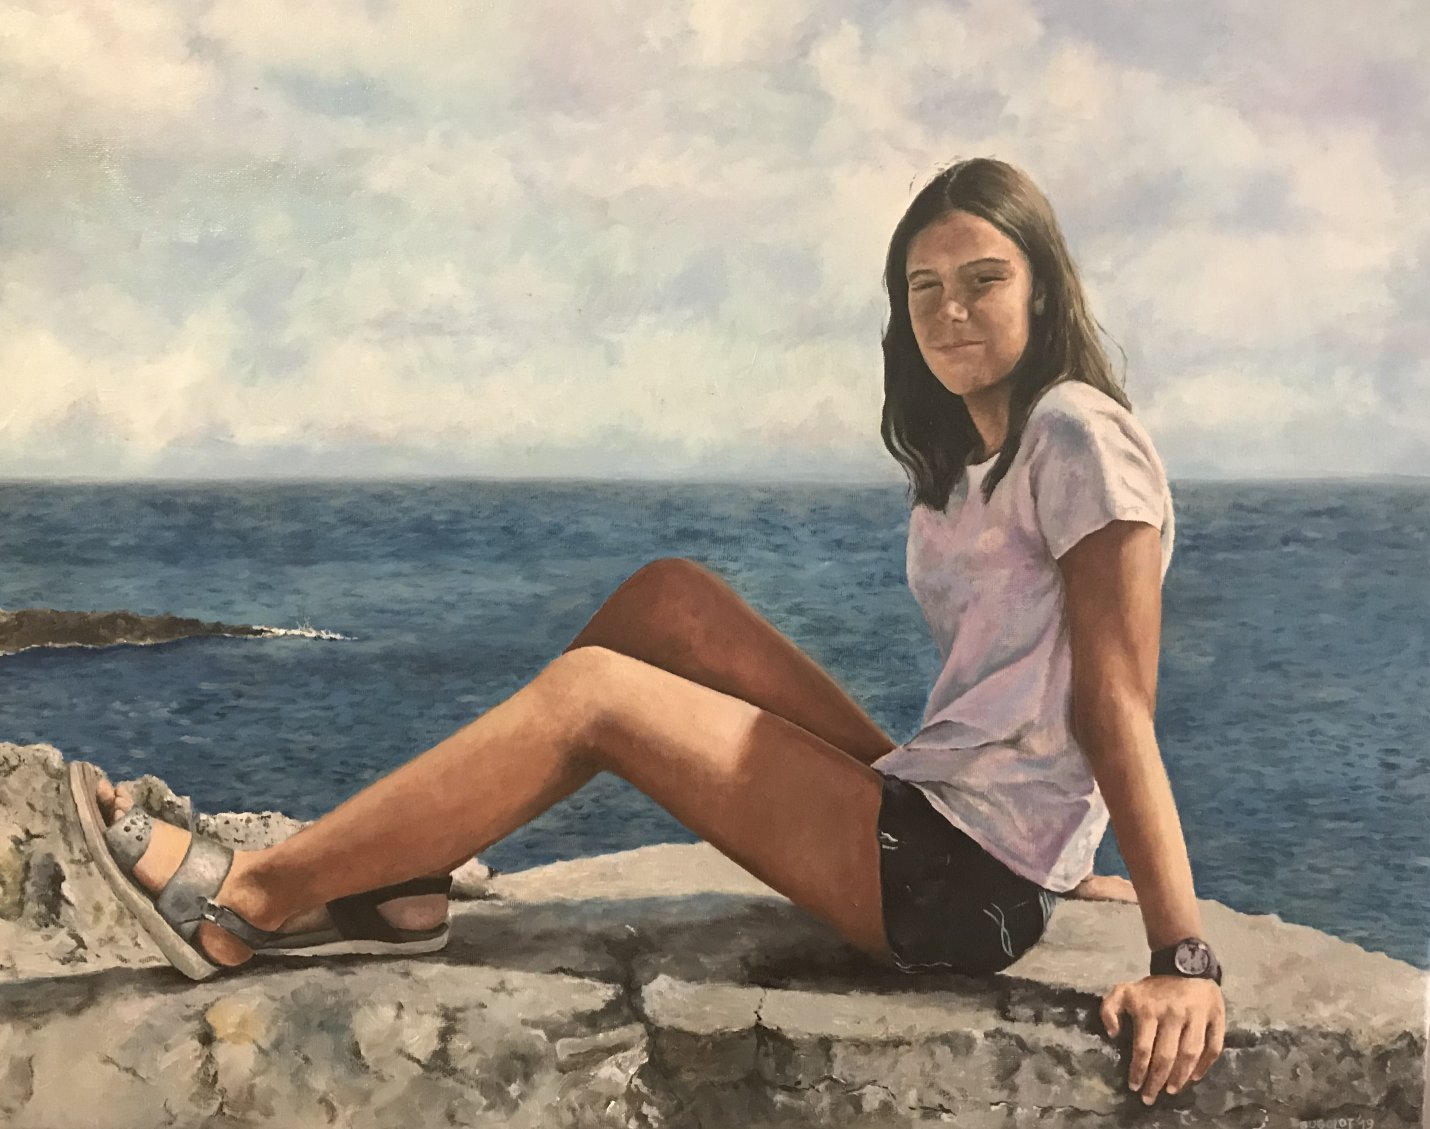 VERANO (2019) - Susana González López-Torres - SUGOLOT